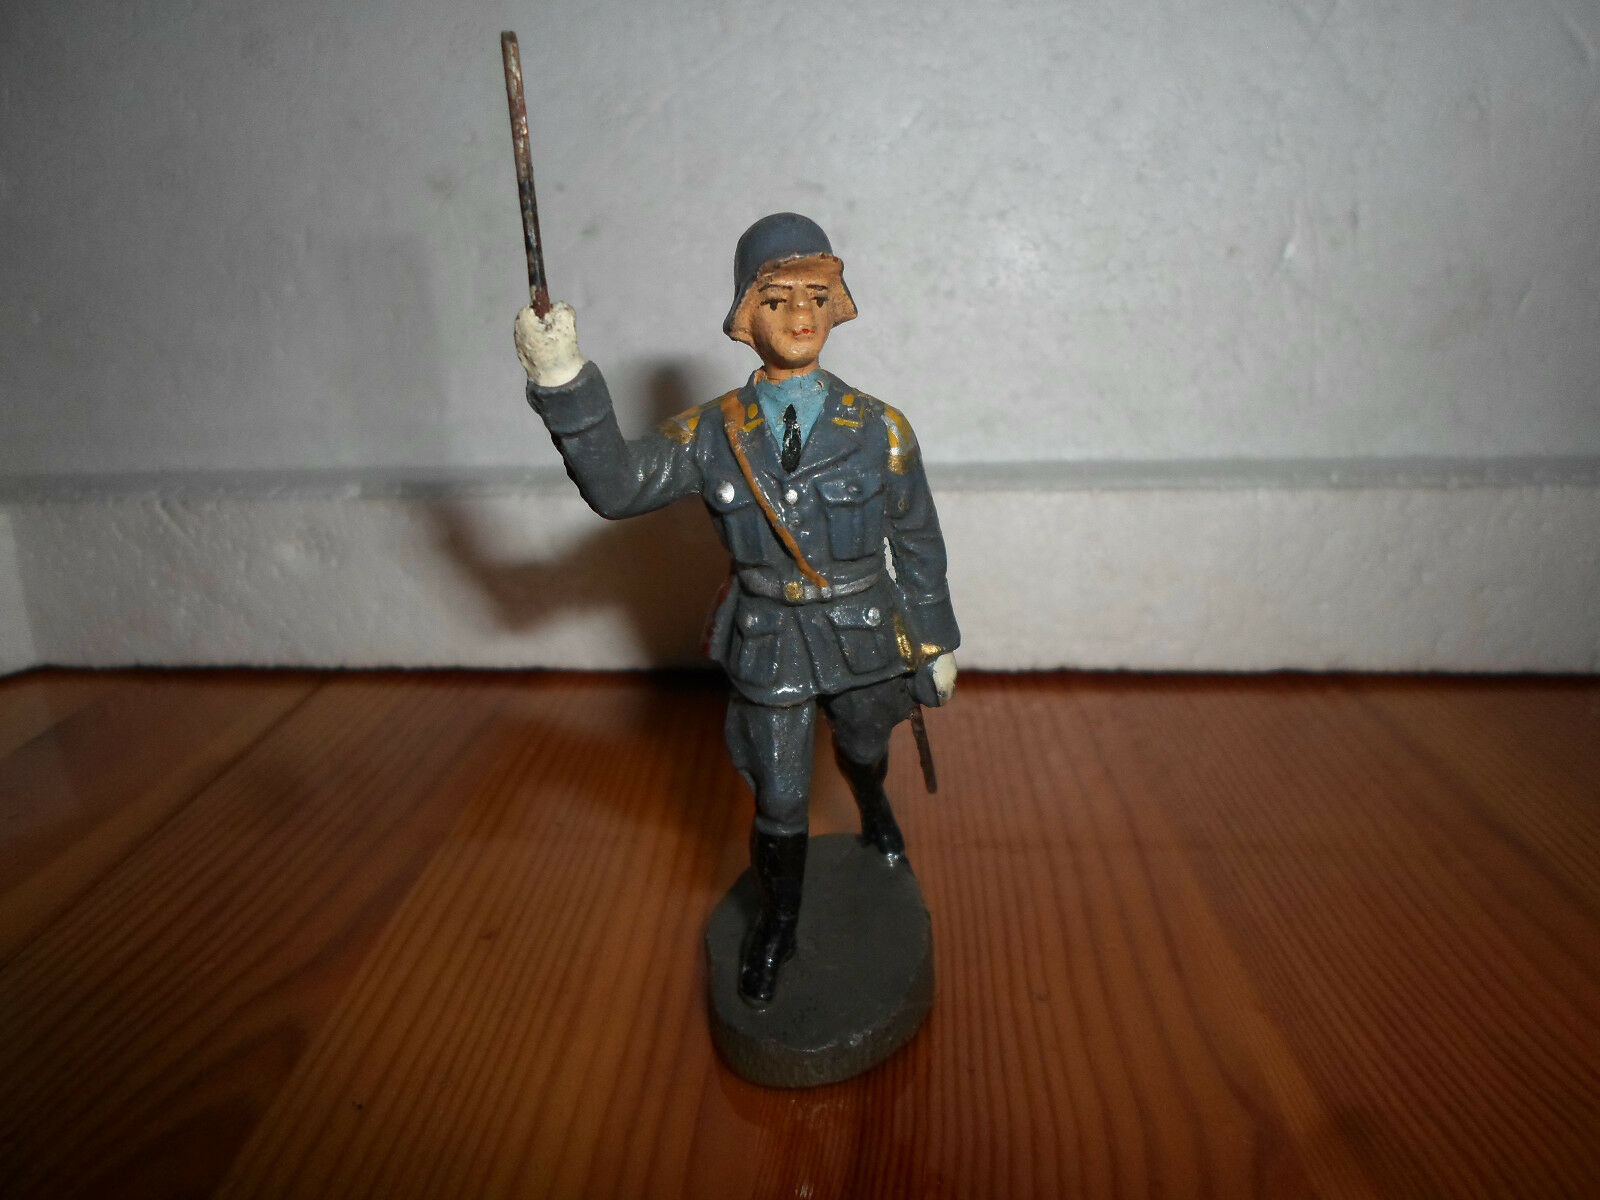 Den alten elastolin lineol deutsche luftwaffe musik dirigent soldat, offizier